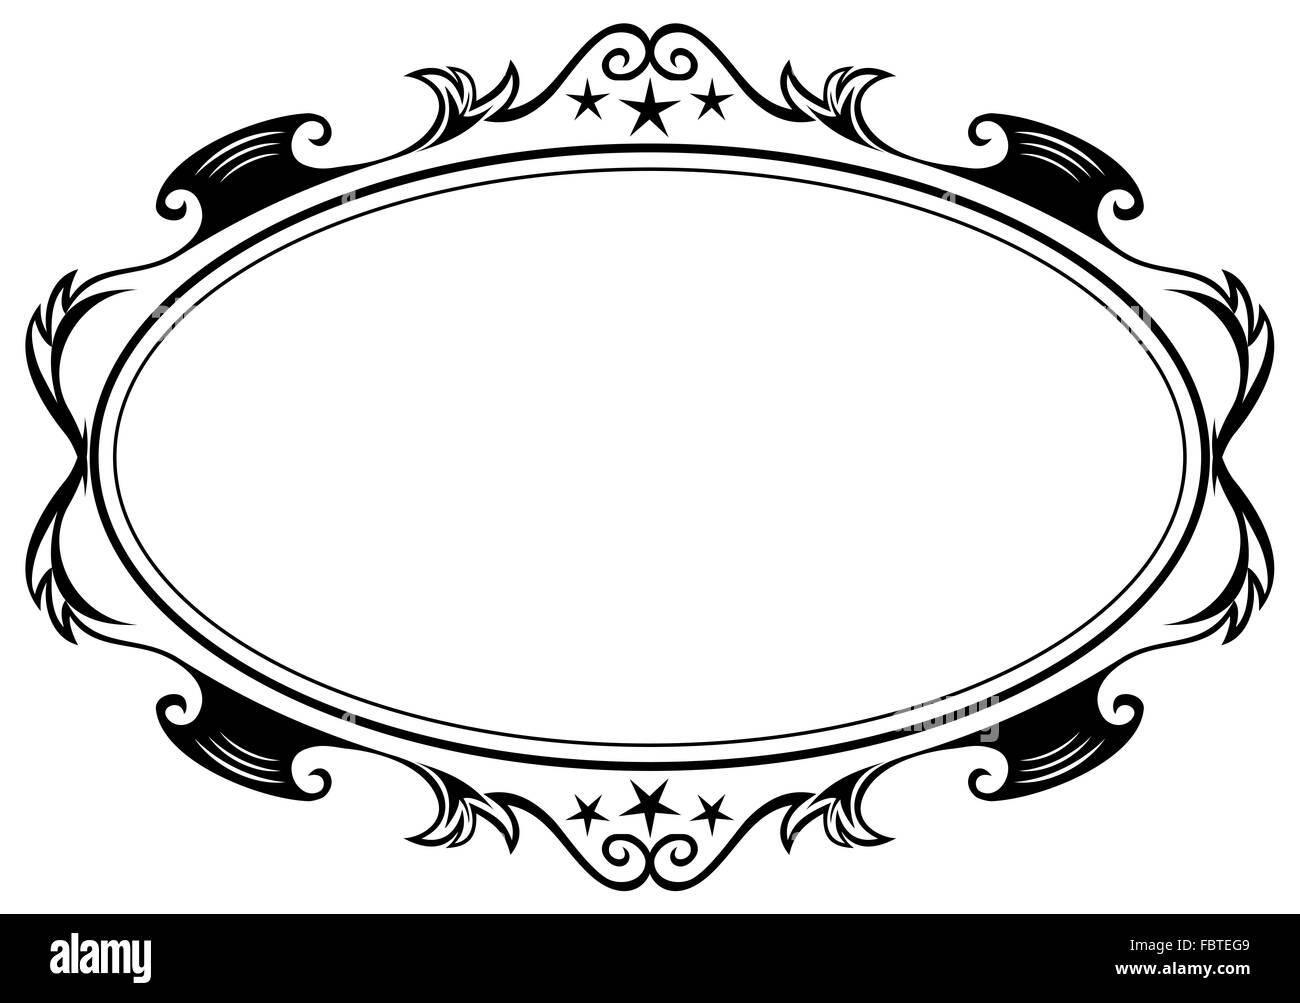 Antiguo marco ovalado Foto & Imagen De Stock: 93351337 - Alamy